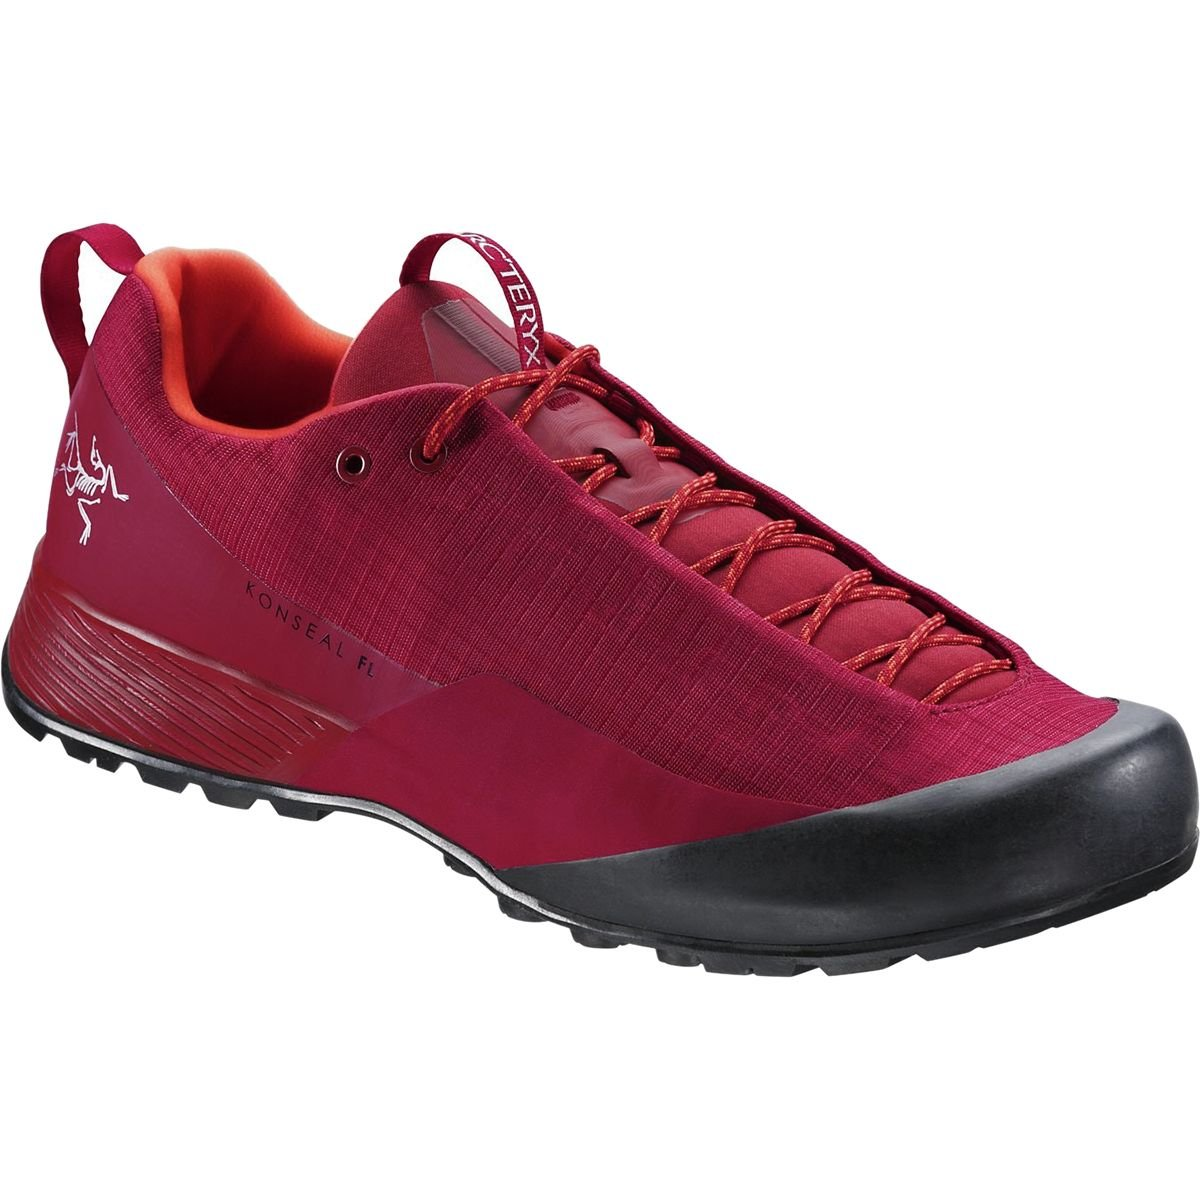 ARC'TERYX(アークテリクス) Konseal FL Shoe Men's コンシール FL シューズ メンズ 22247 B071G2BDKD 25.5 cm Red BeachSafety